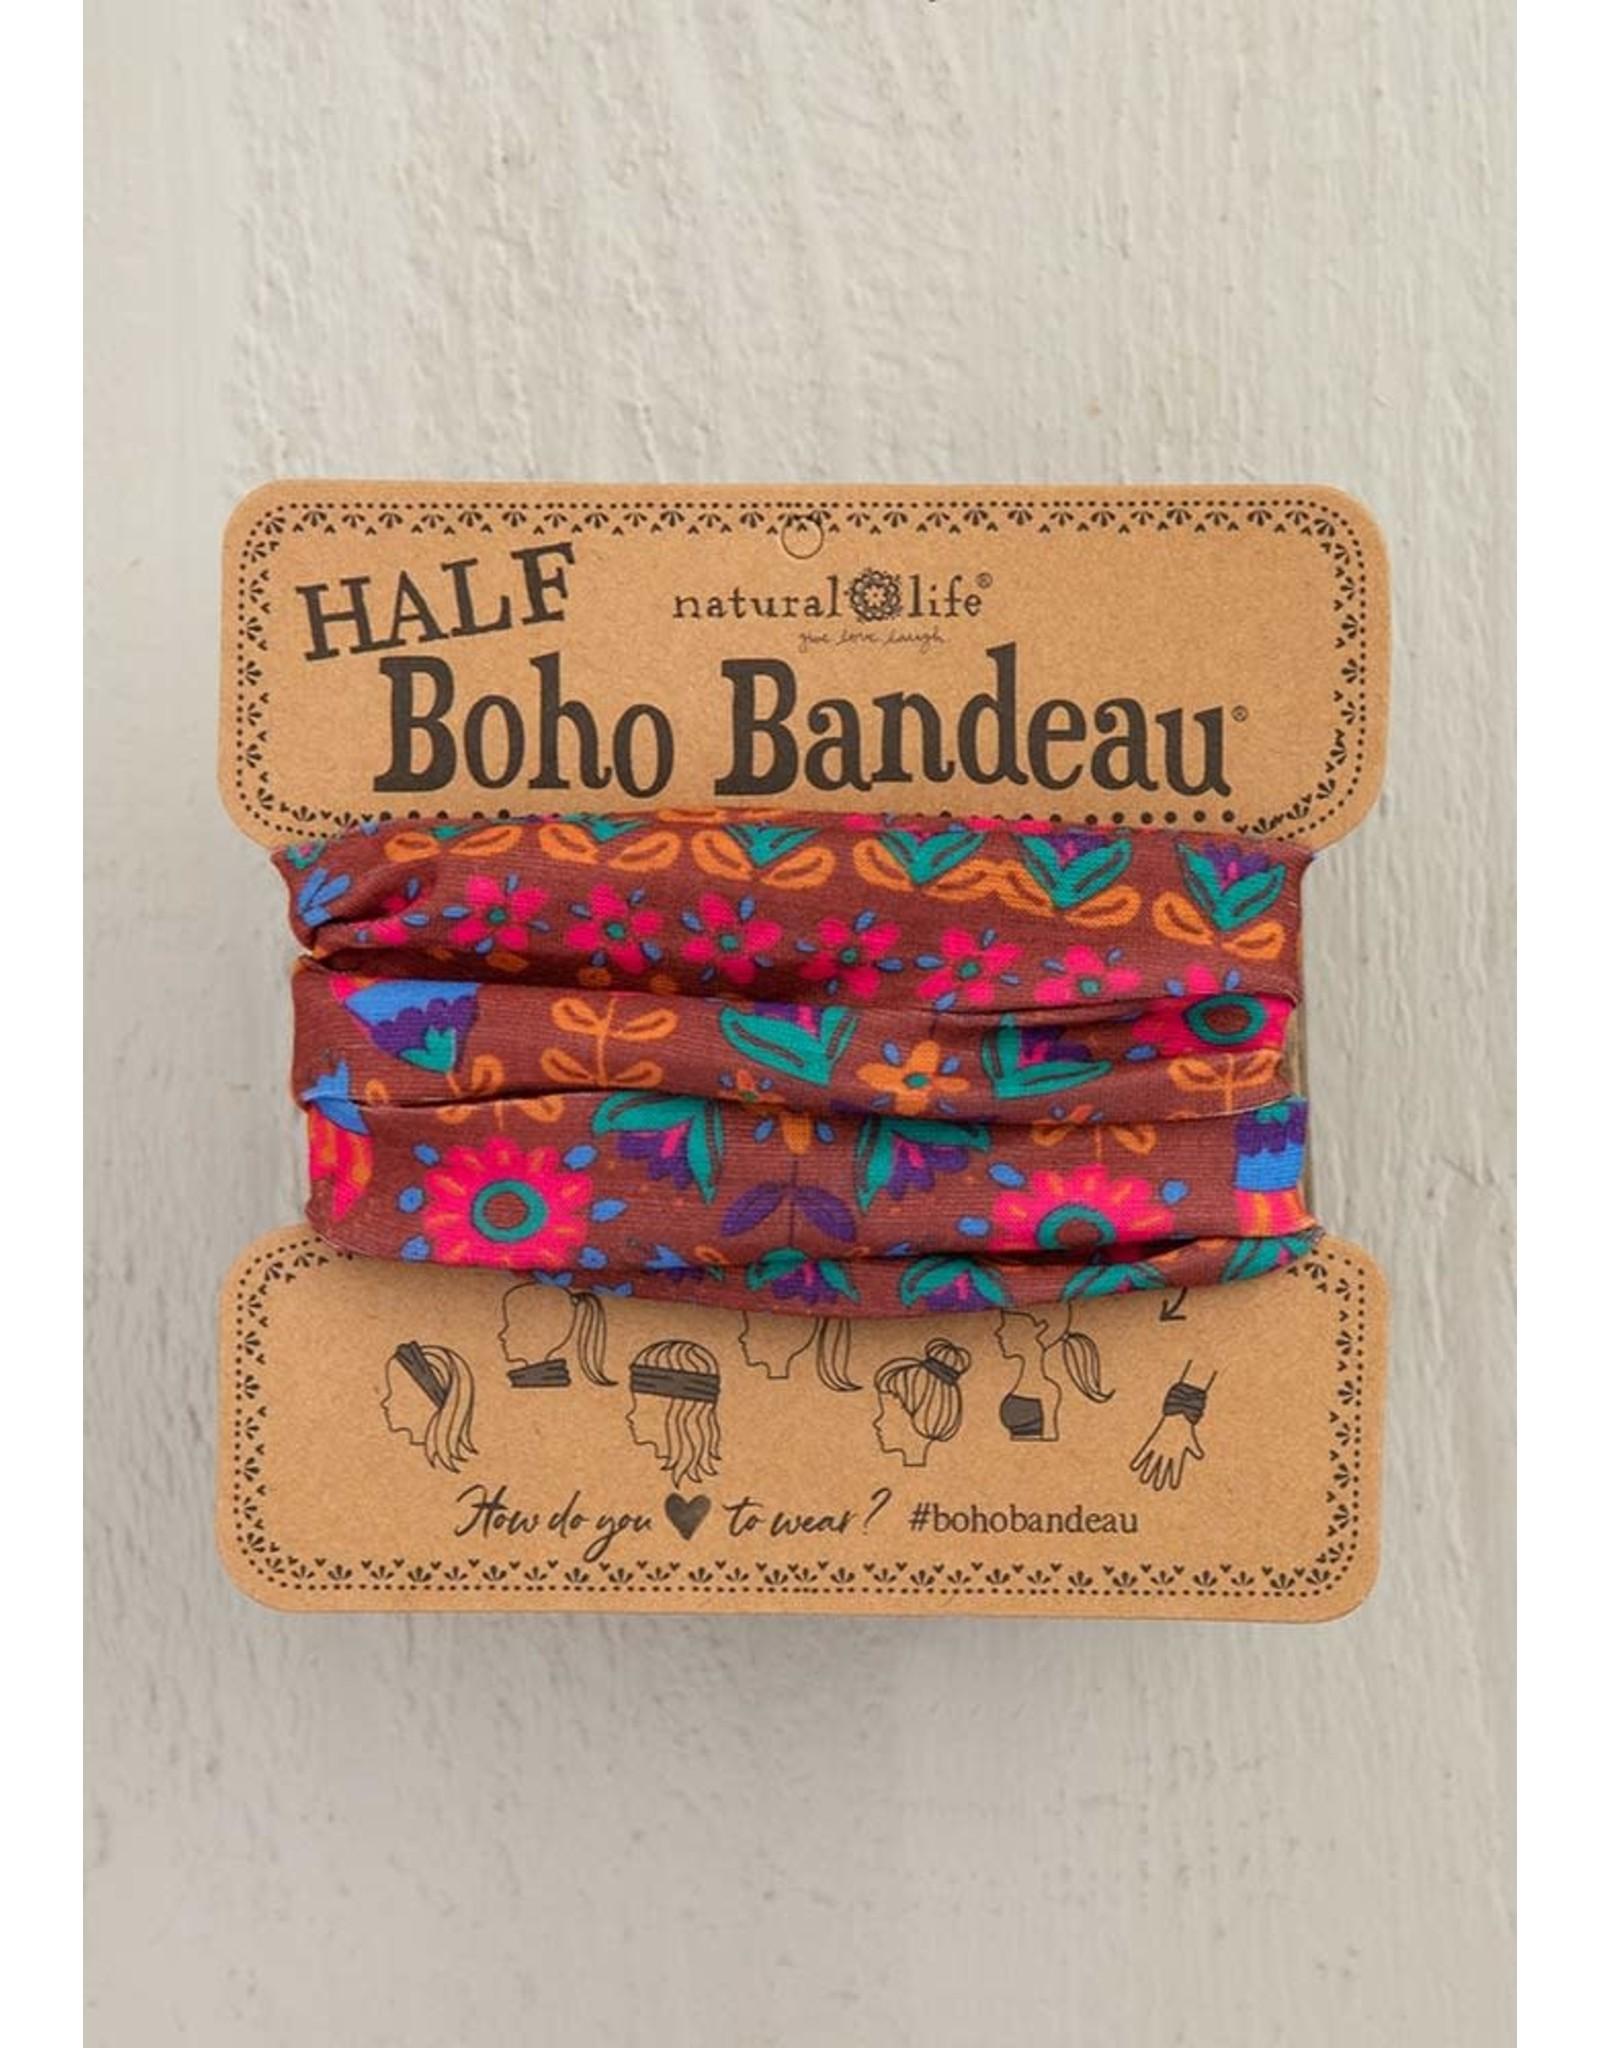 Natural LIfe Half Boho Bandeau, Red Floral Mandala